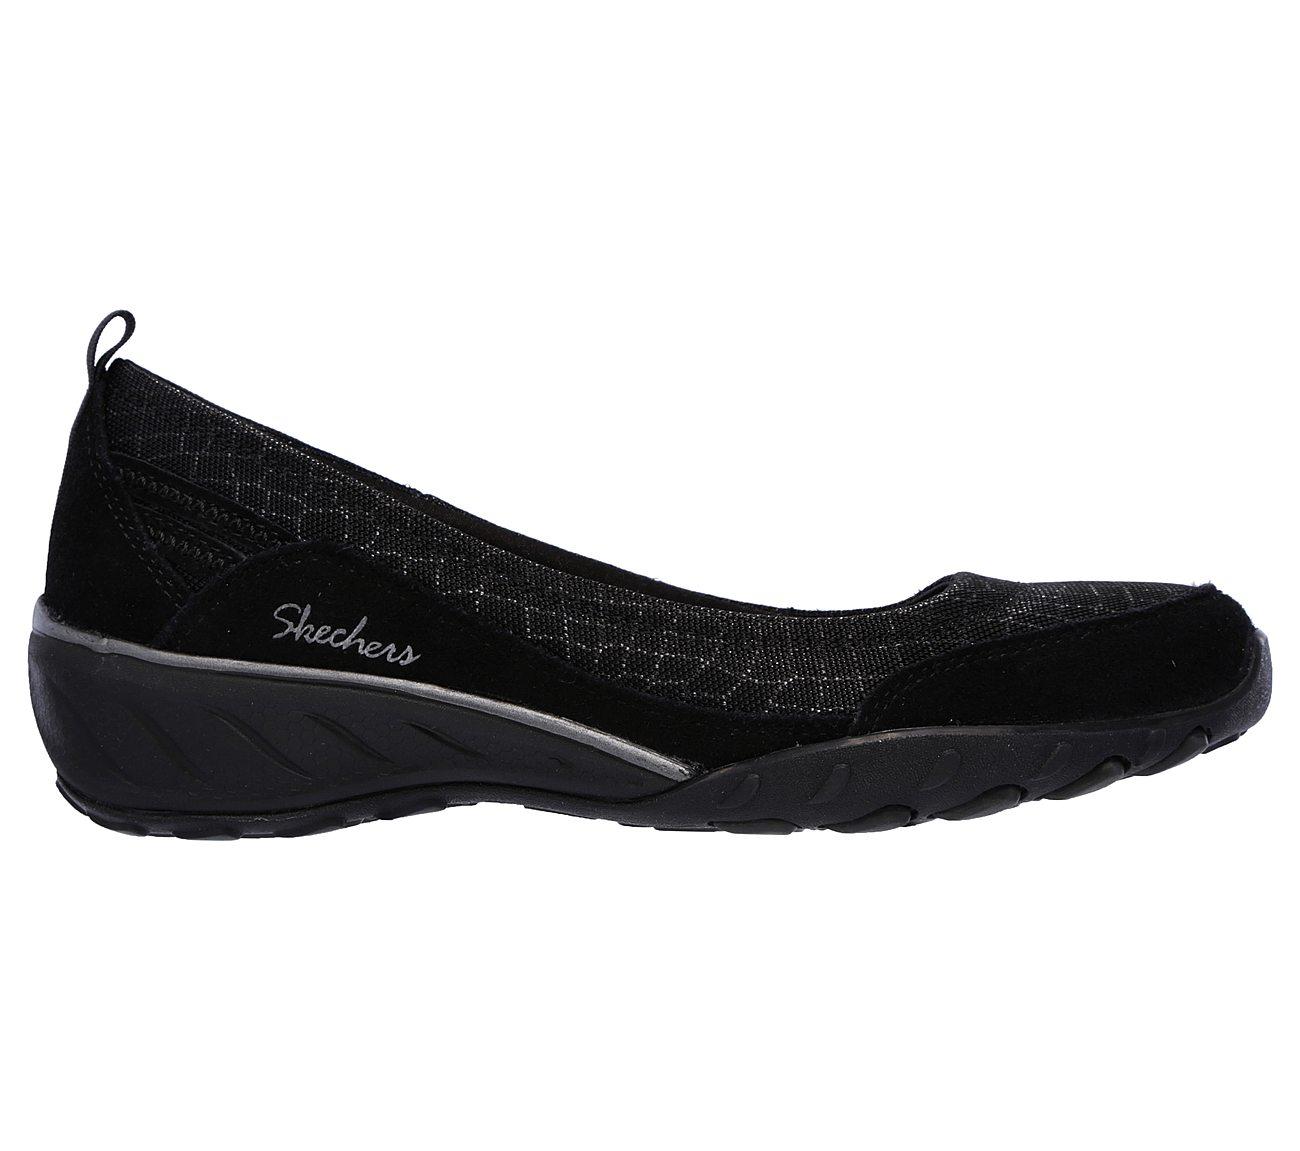 Skechers Shape Ups | Trainers | Shoes | Women | Very.co.uk